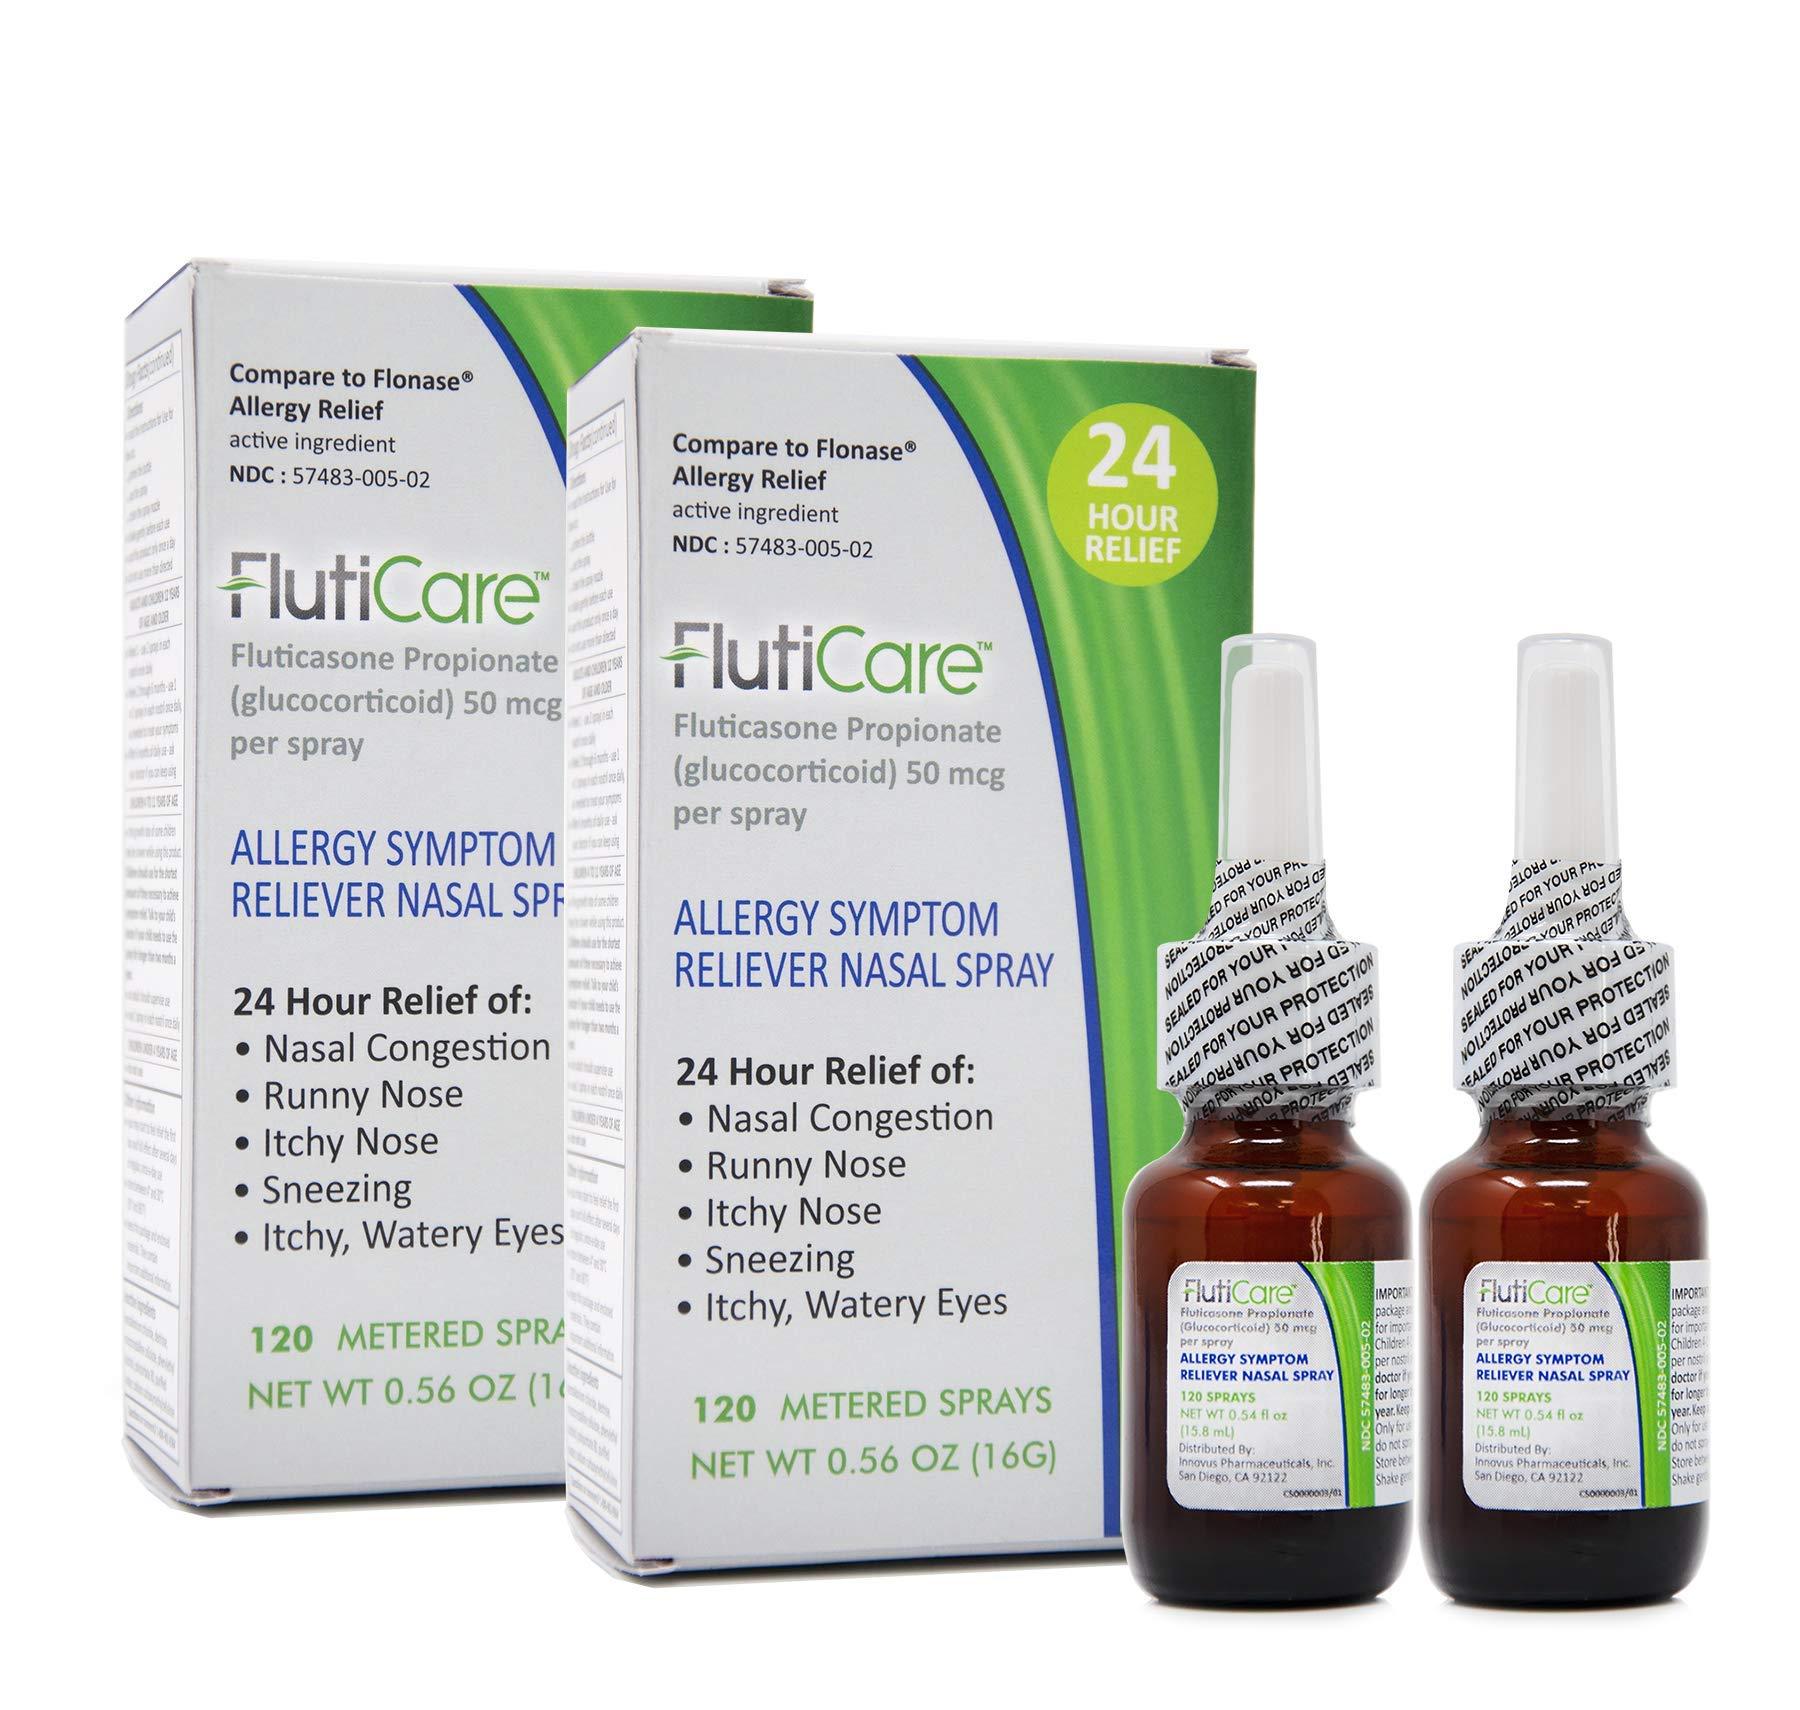 FlutiCare - 120 metered Nasal Sprays (2 Pack) | Fluticasone Propionate 50mcg | Relief